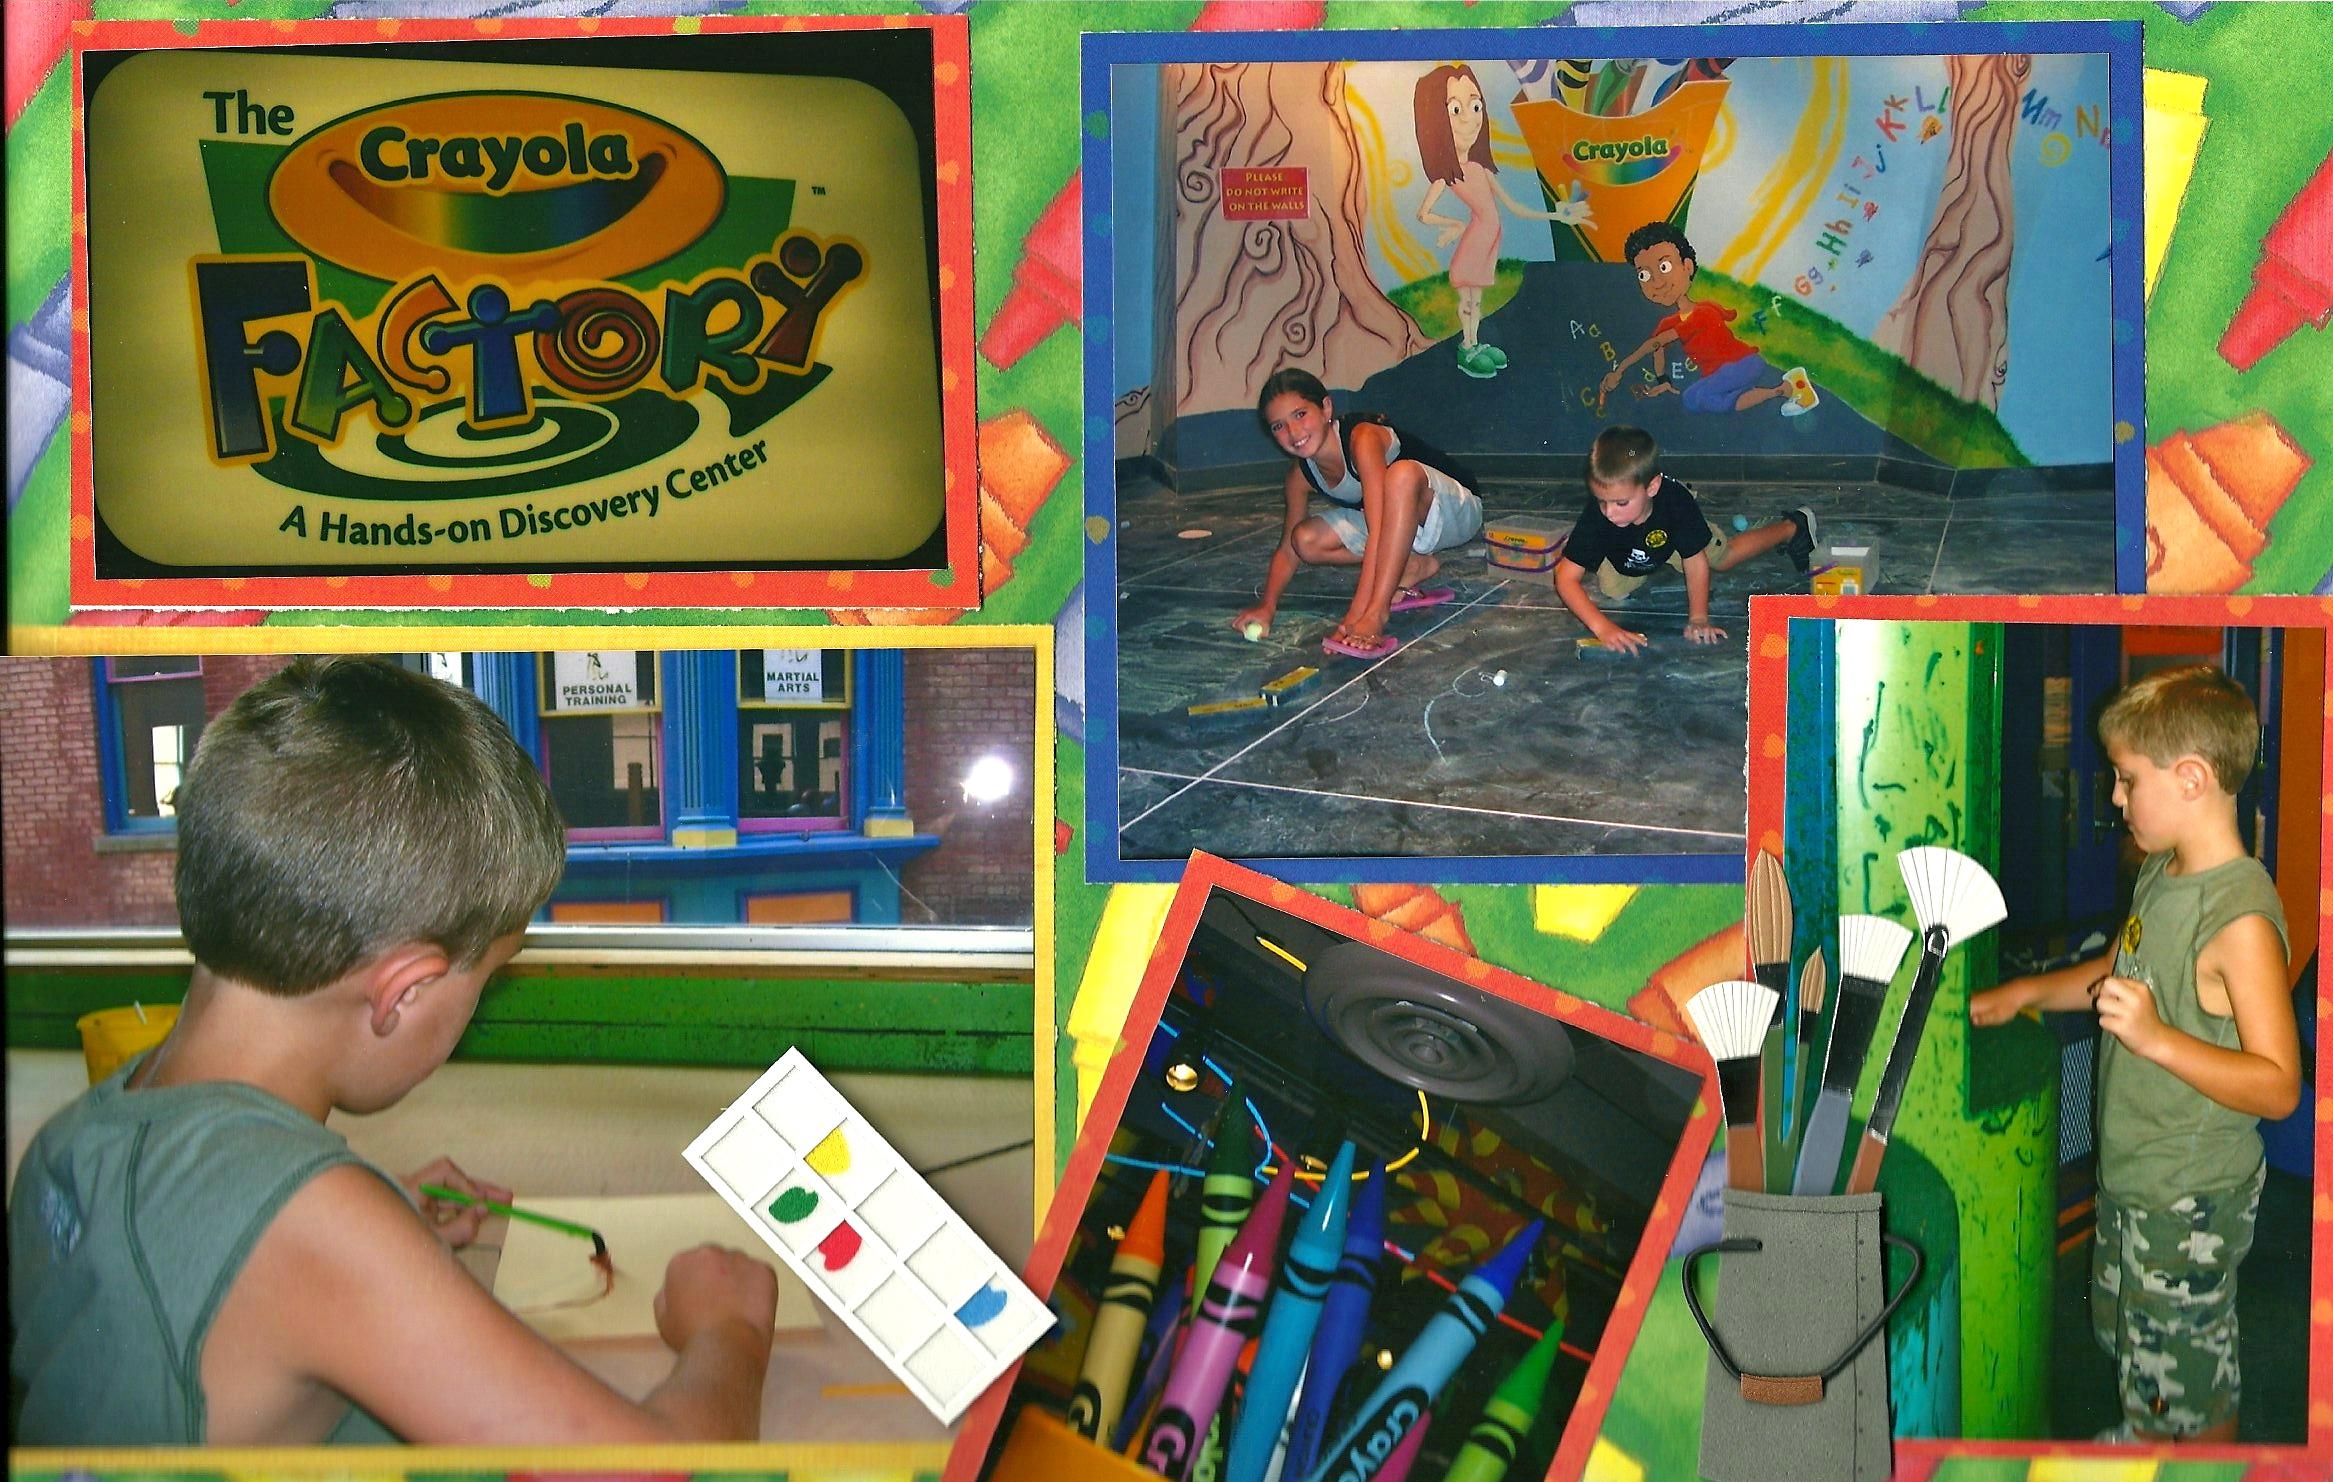 fun times at the crayola factory